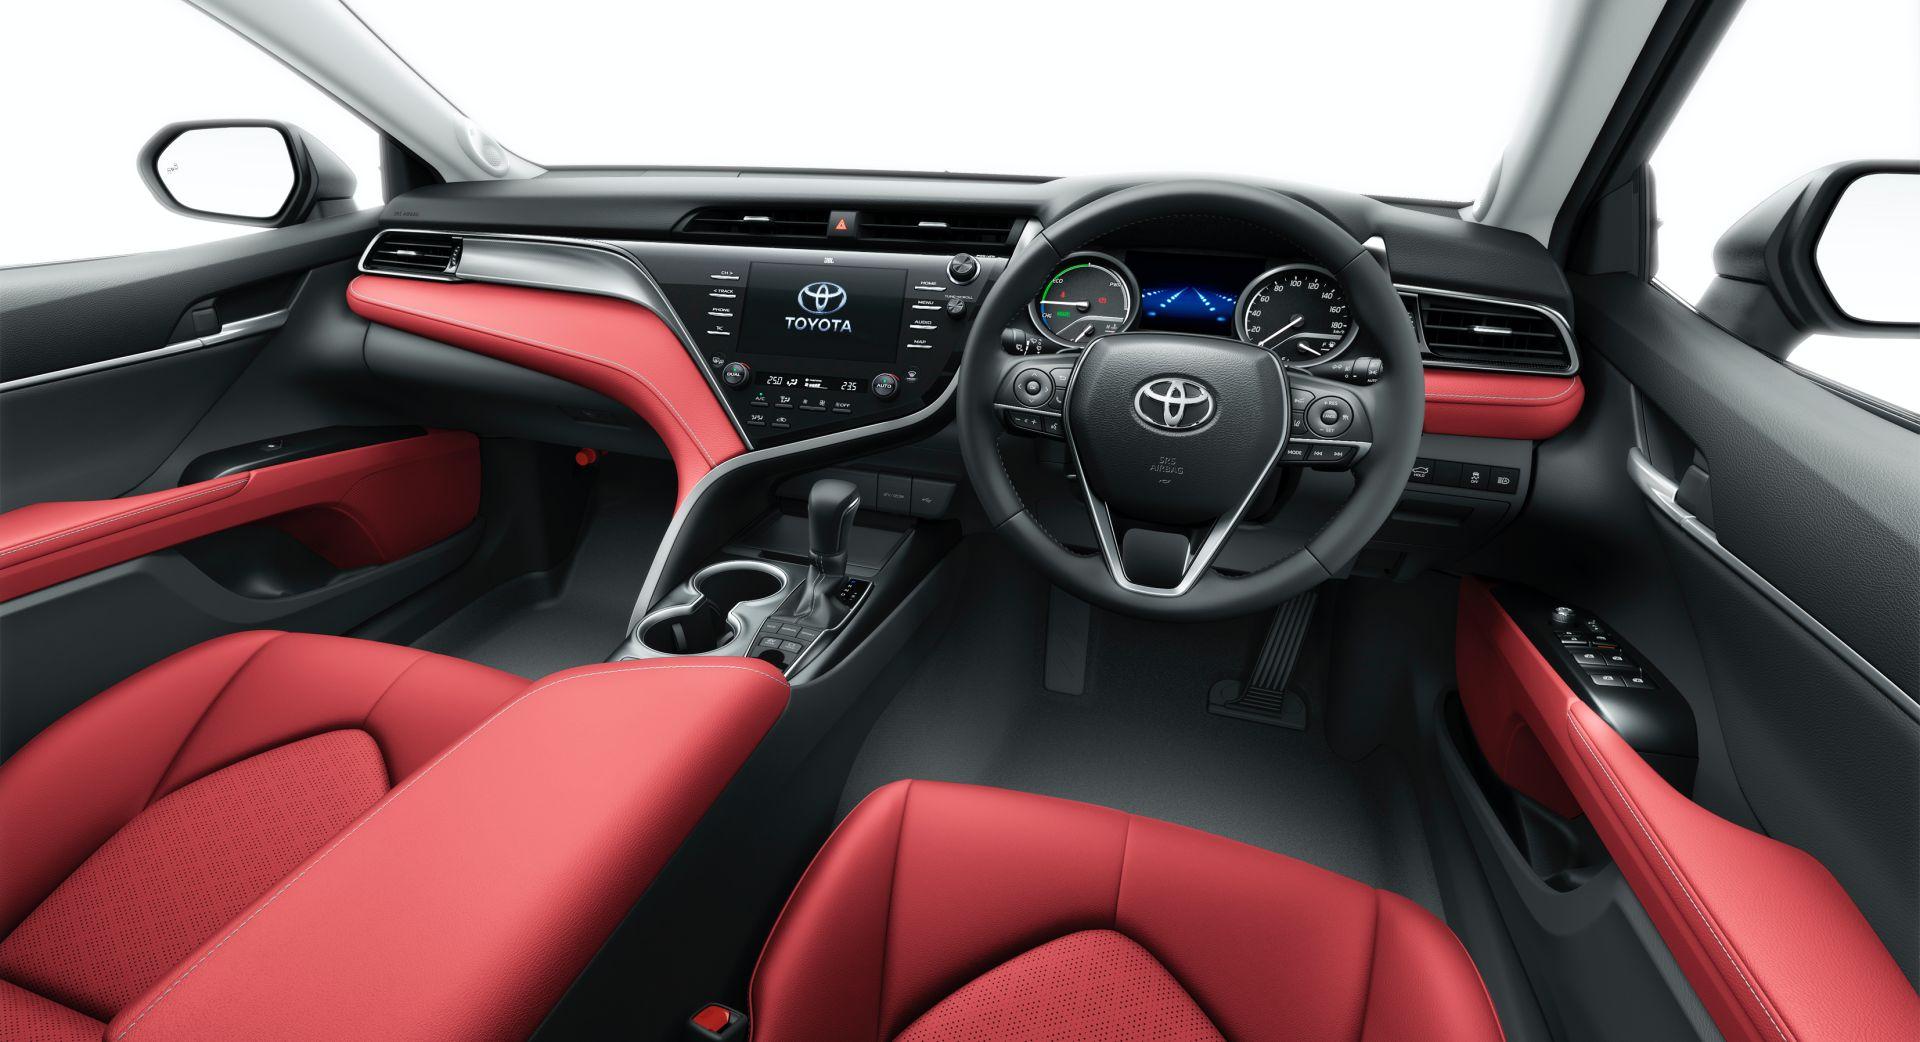 салон Toyota Camry WS Black Edition 2020—2021